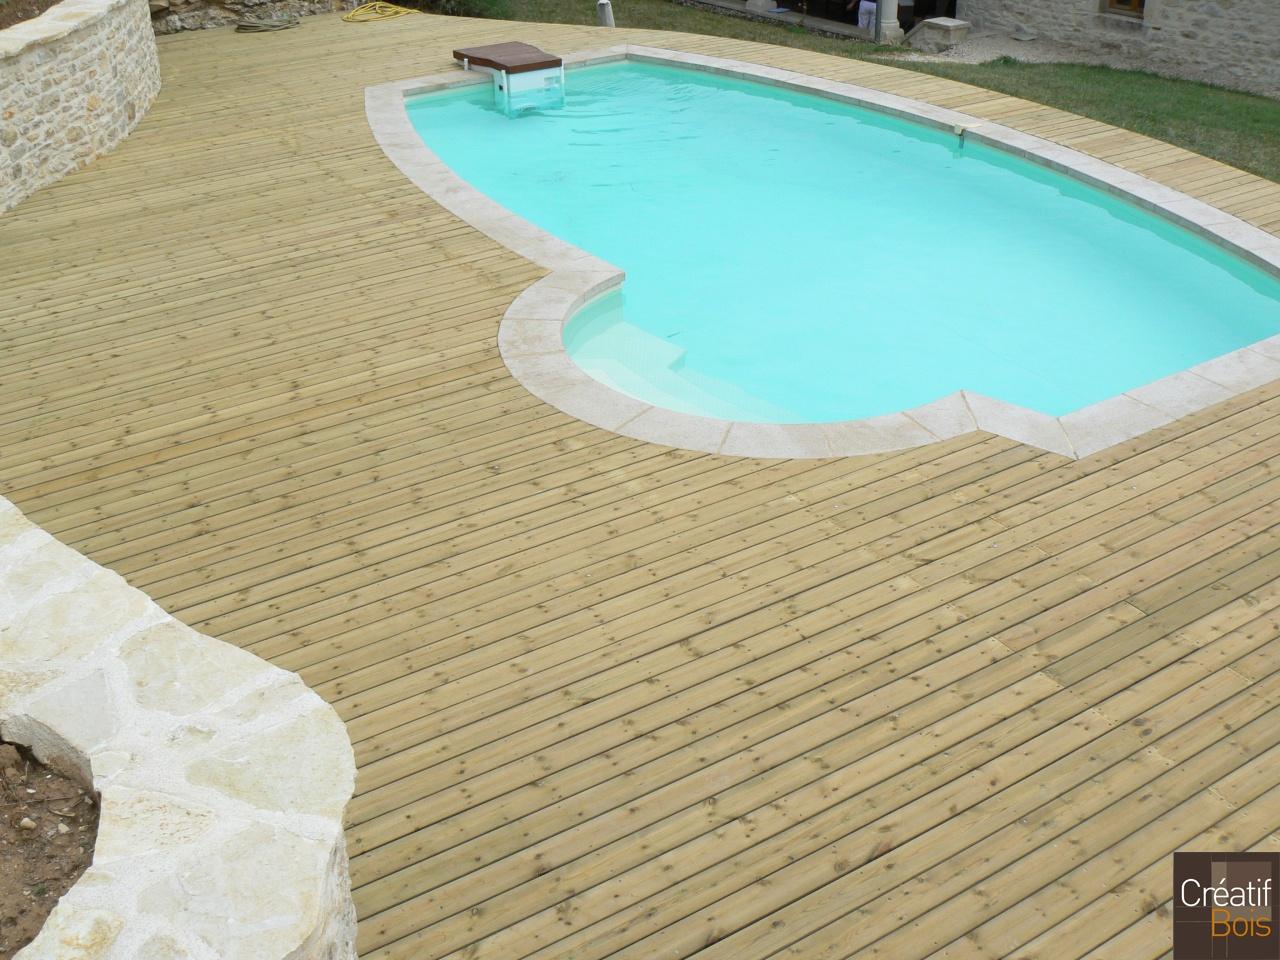 plage de piscine espere lot 46 plages de piscine. Black Bedroom Furniture Sets. Home Design Ideas